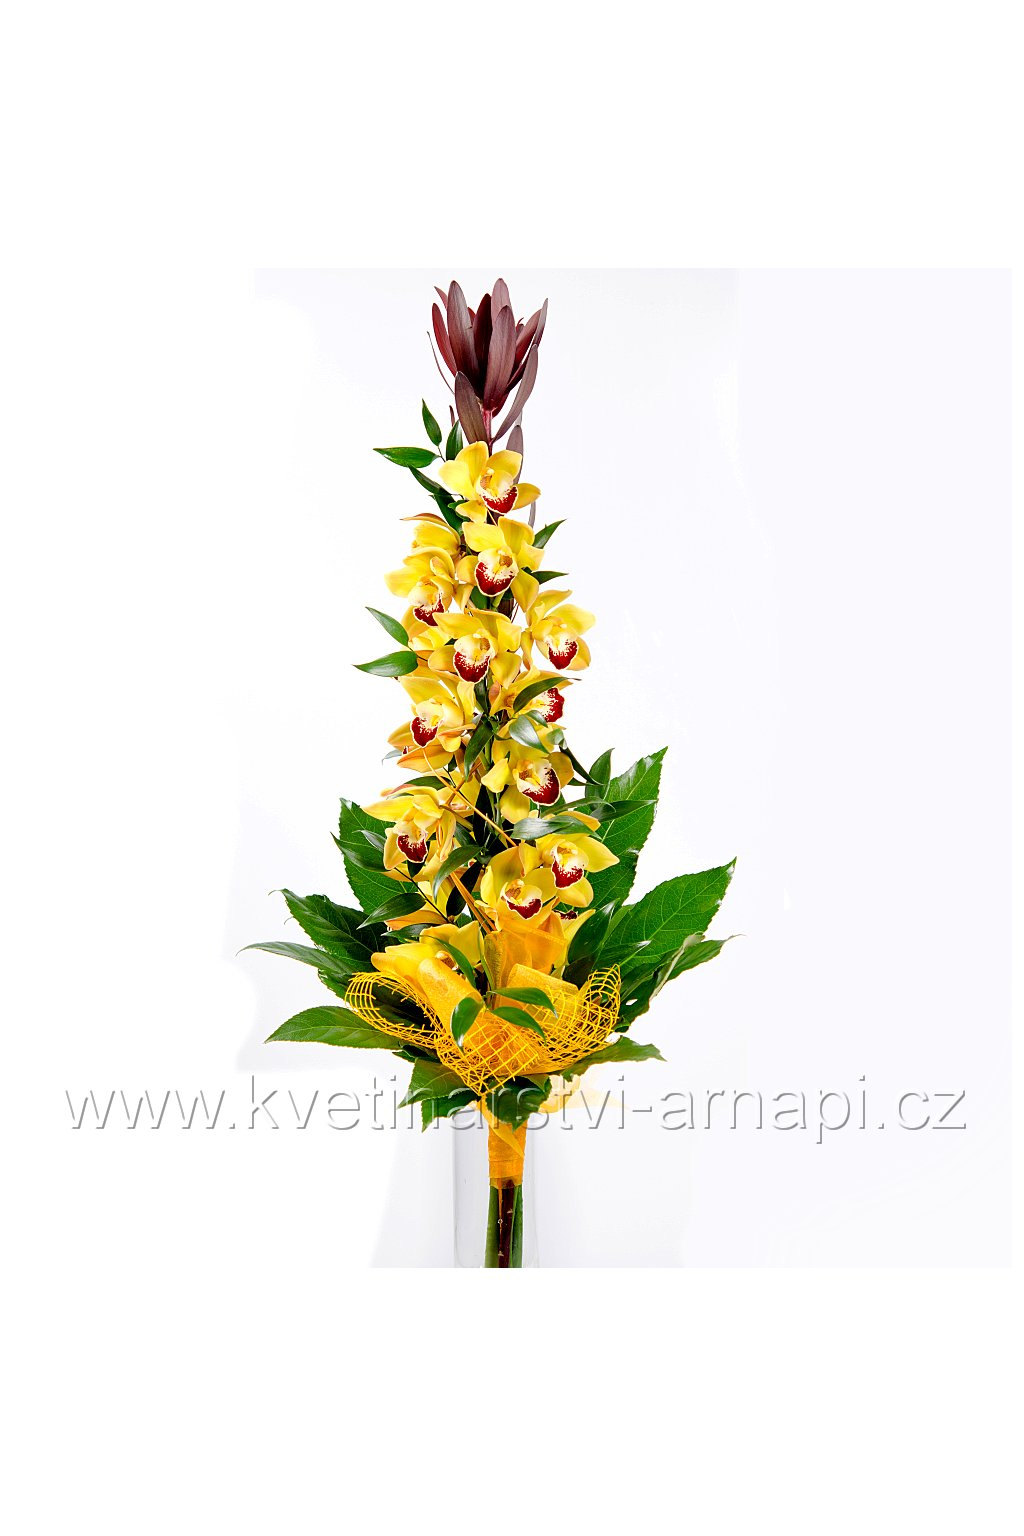 darkova kytice orchidej on line kvetiny kvetinarstvi arnapi